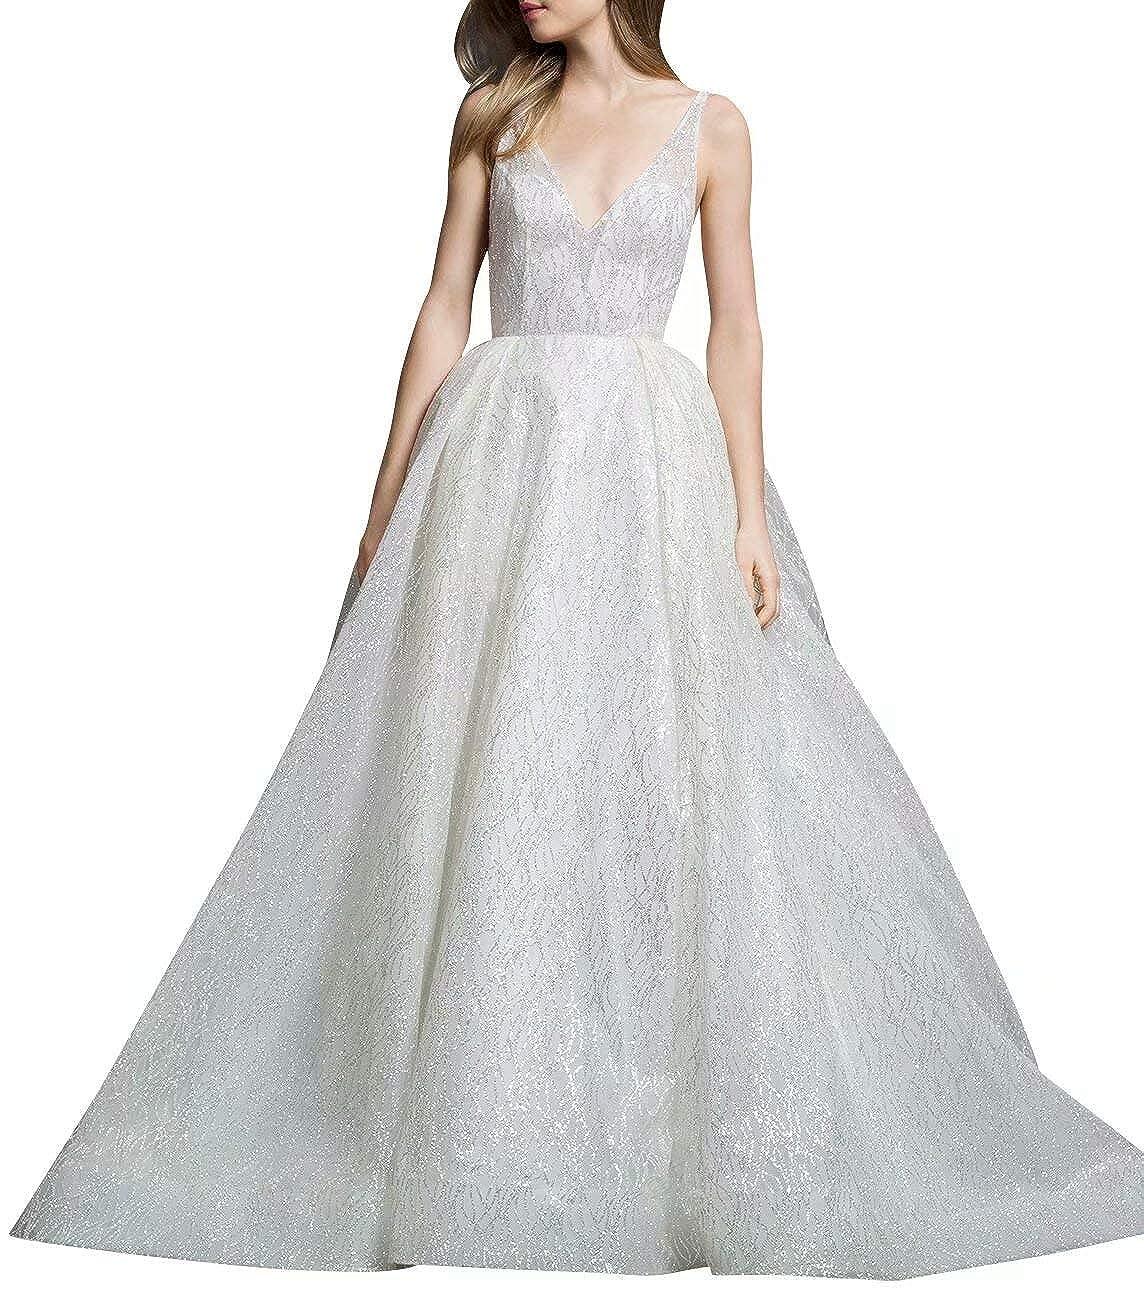 VNeck Sparkling Wedding Dress Backless Sleeveless Tulle Formal Bride Evening Gown, Ivory, 10